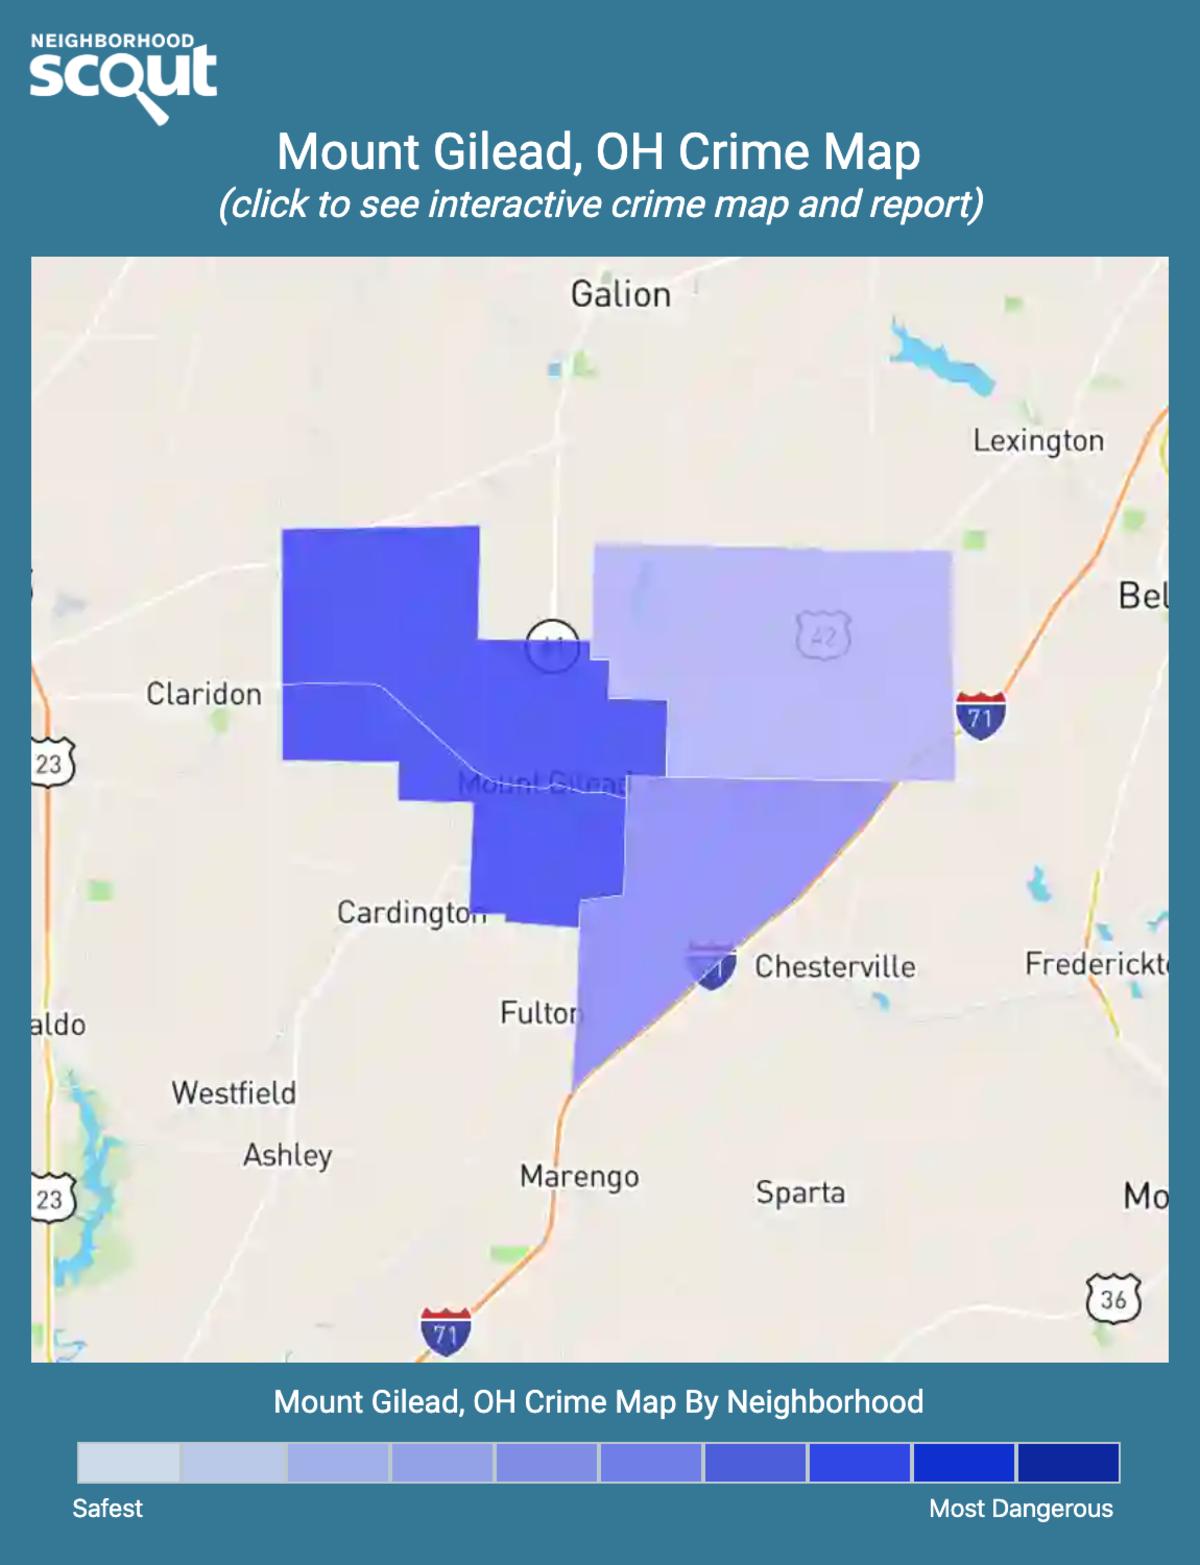 Mount Gilead, Ohio crime map